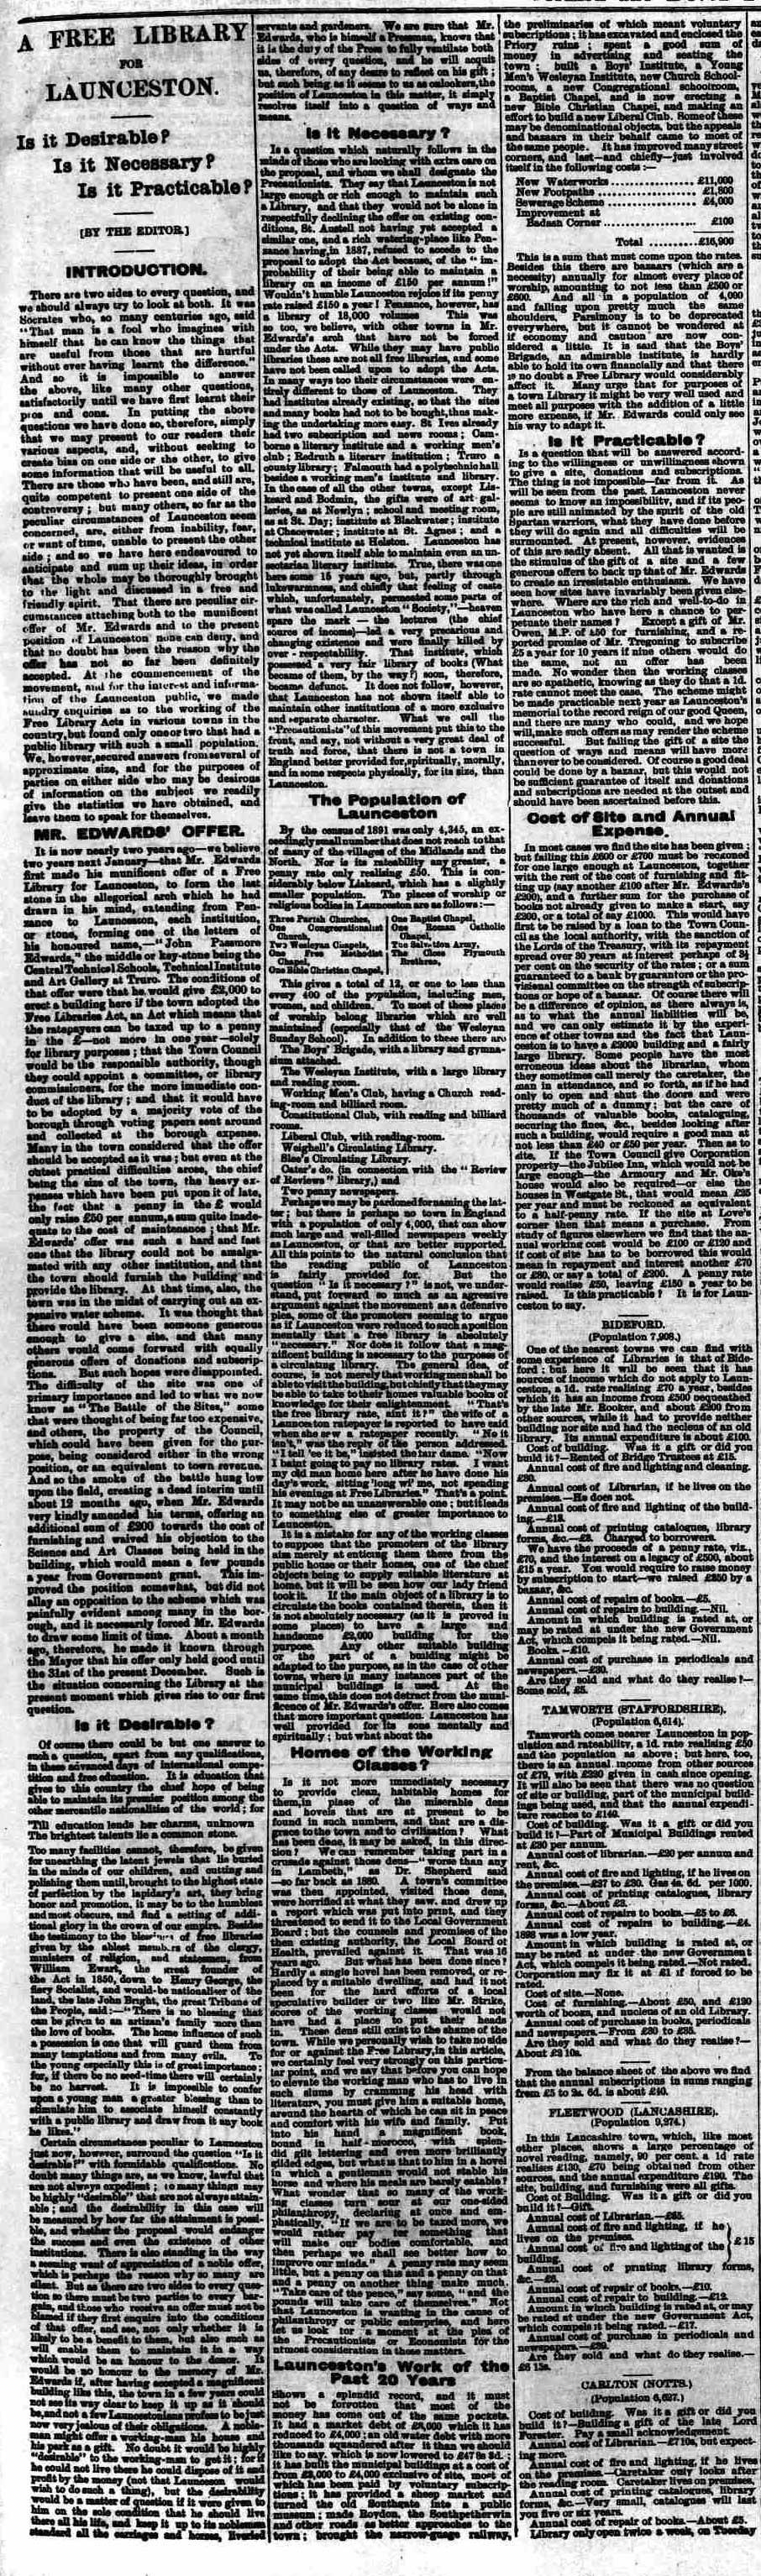 05 December 1896 part one